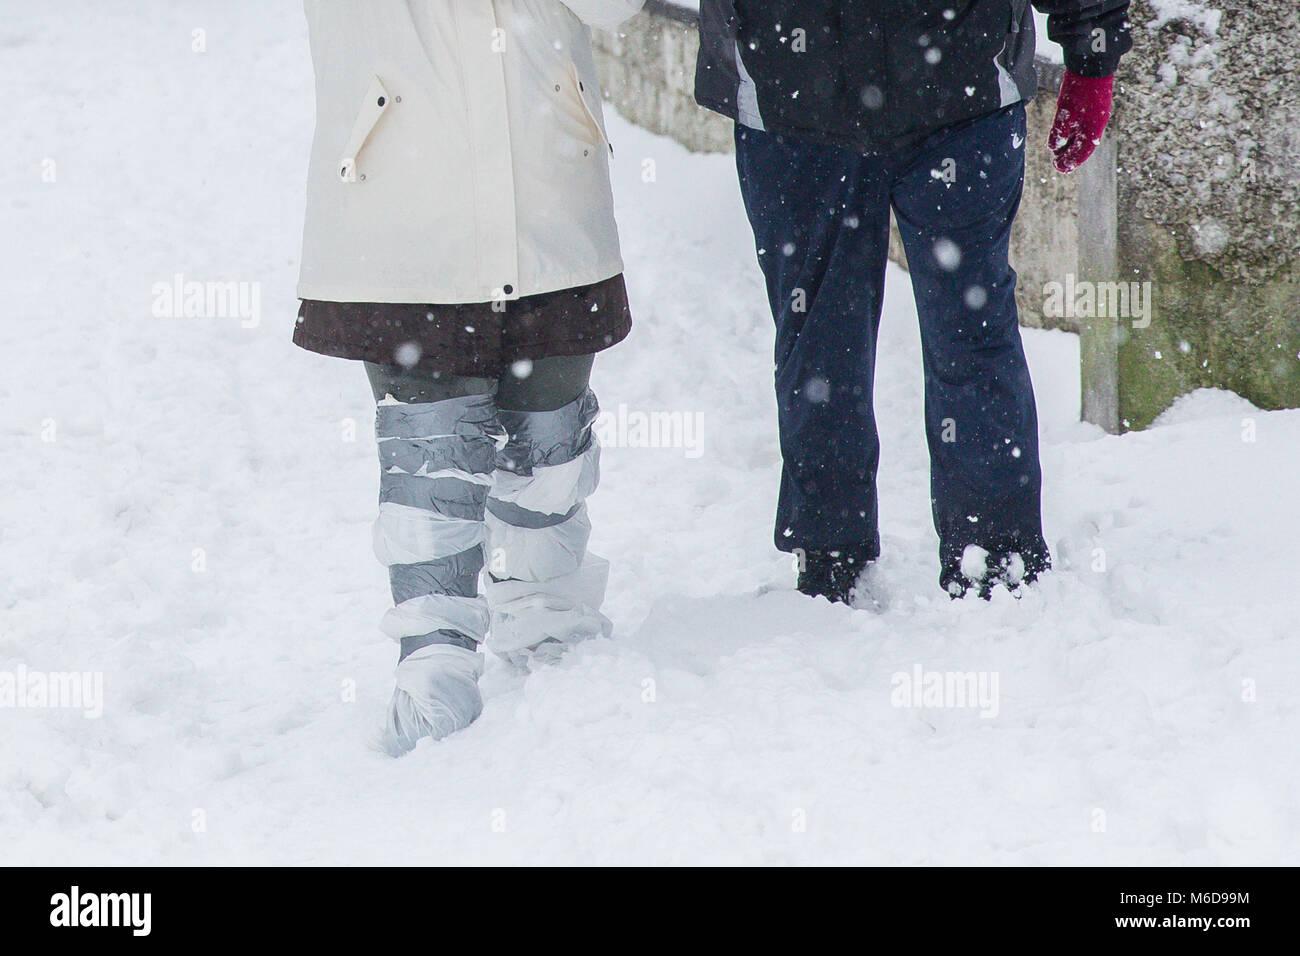 Celbridge, Kildare, Ireland. 02 Mar 2018: Couple out walking through the snow with plastic bags wrapped around legs - Stock Image